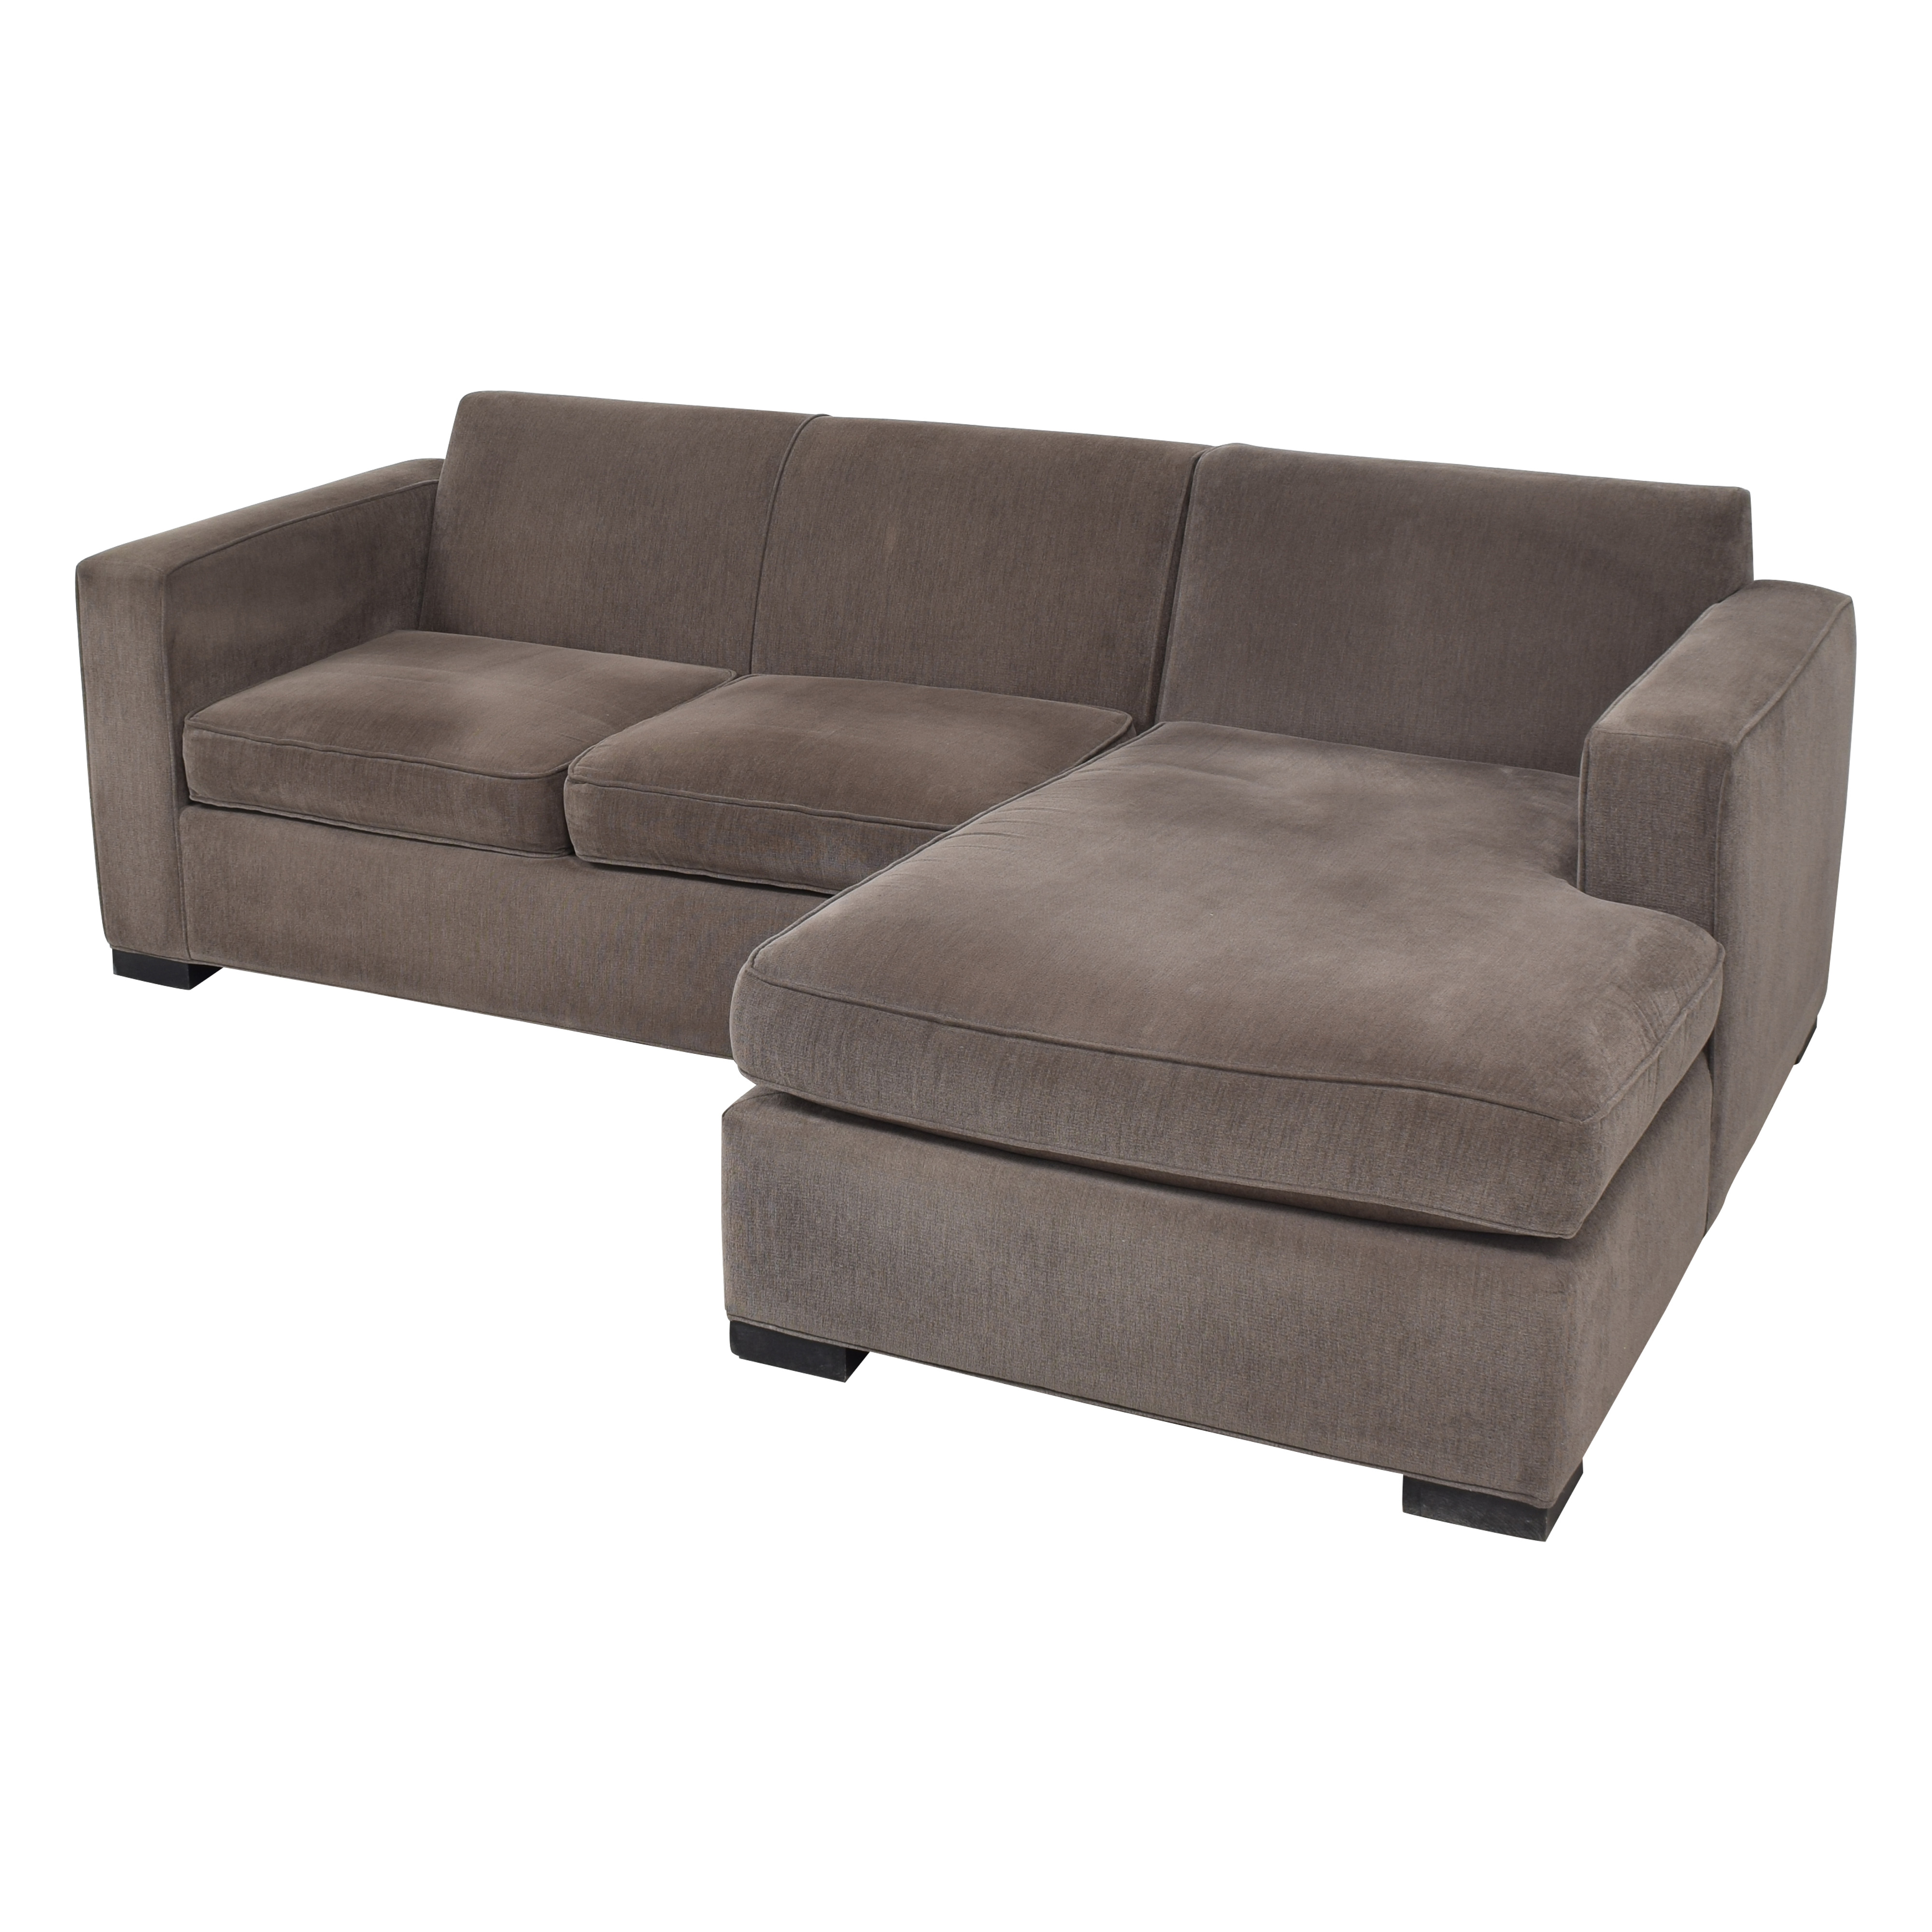 Room & Board Morrison Sectional Sofa Room & Board